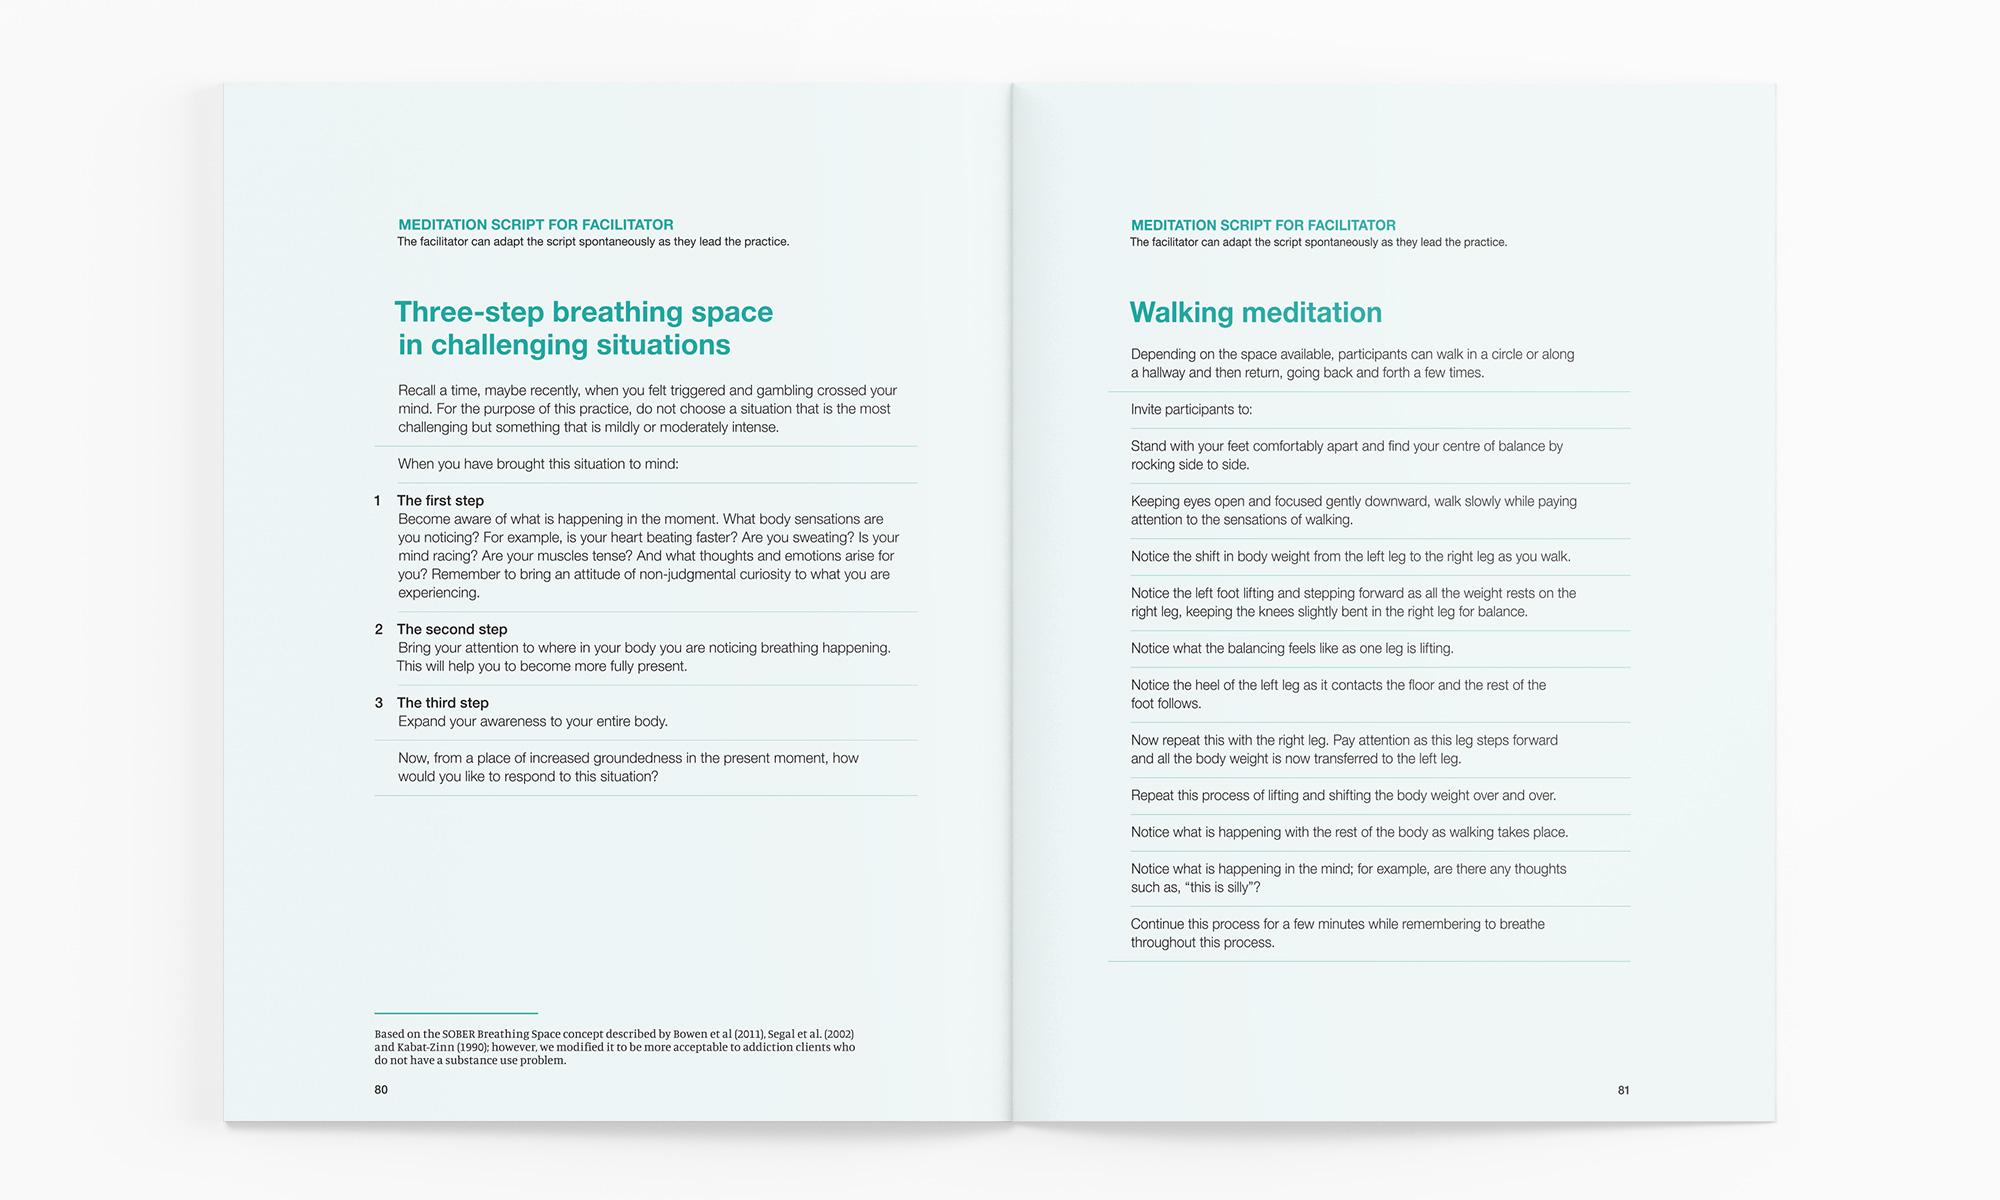 CAMH_GamblingManual_Ebbnflowcreative_Brochure_Publicationdesign_5.jpg